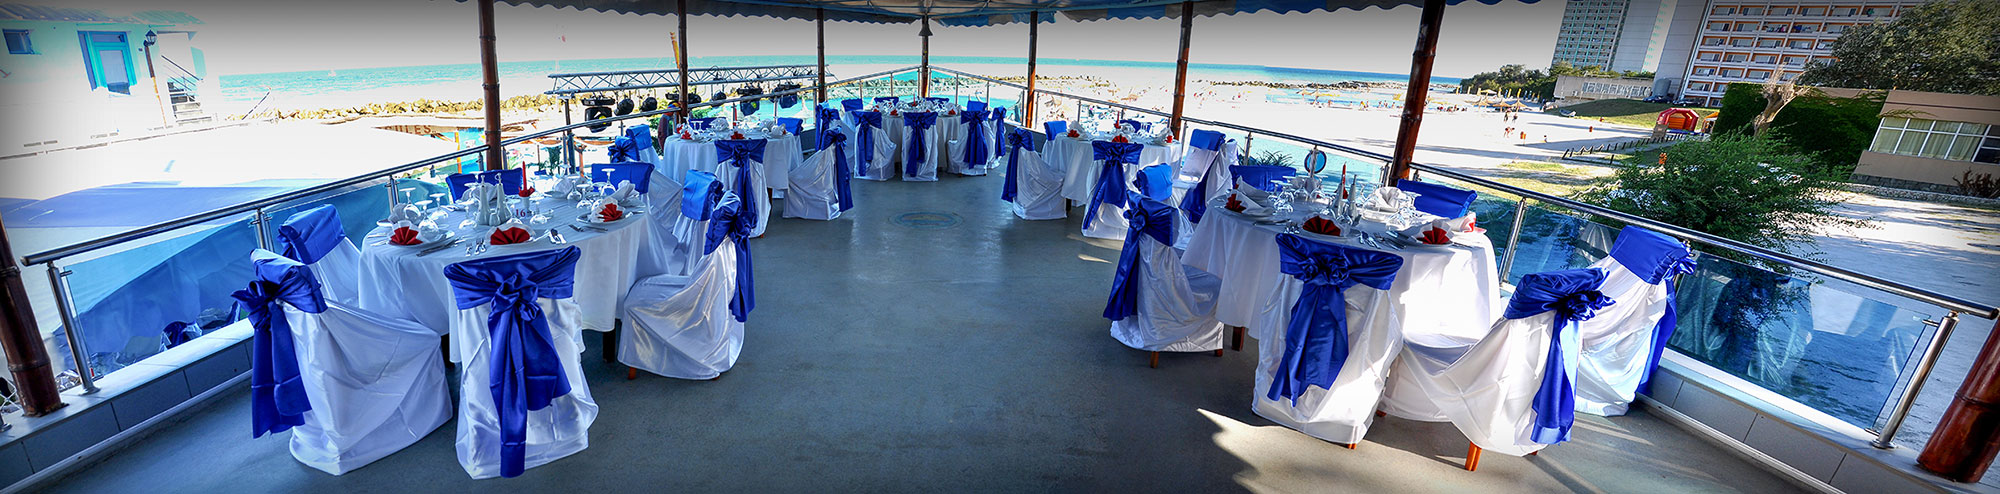 Evenimente - Nunti, botezuri, mese festive, aniversari, majorate, intalniri, petreceri la malul marii